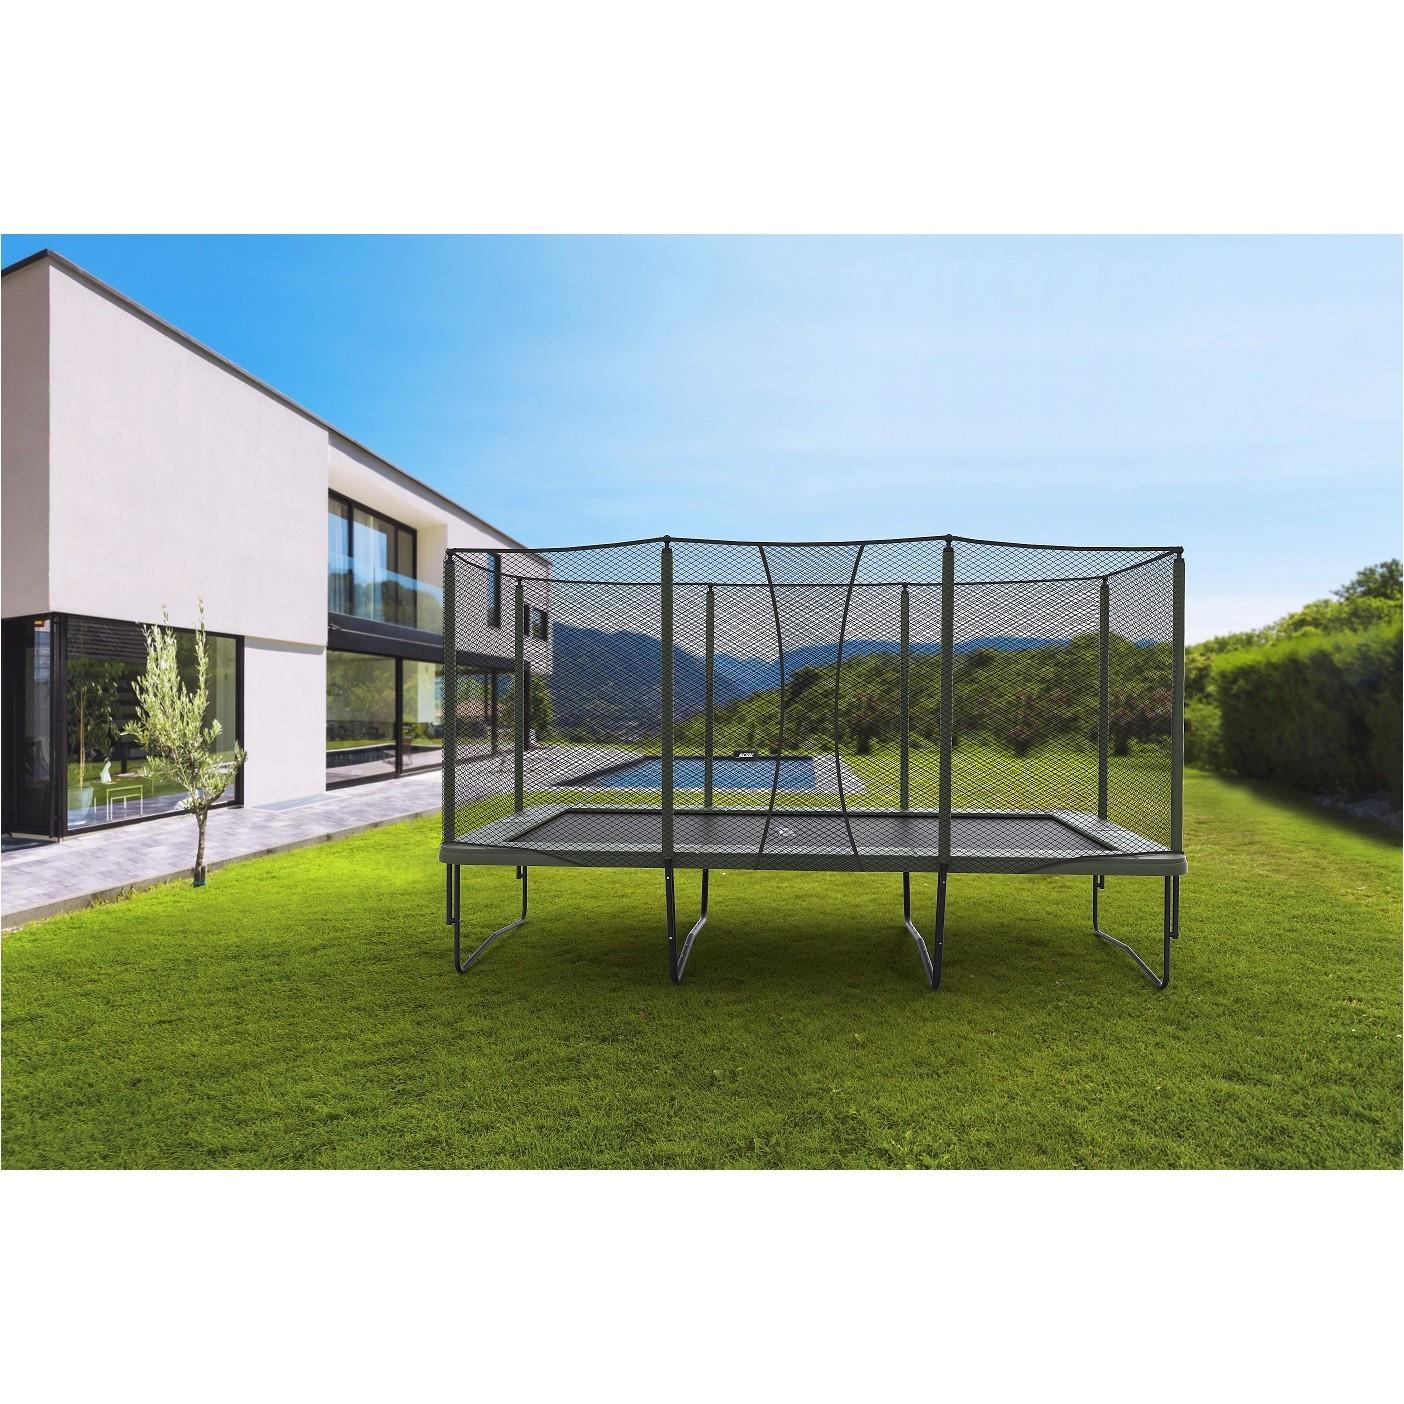 acon air 16 sport trampoline